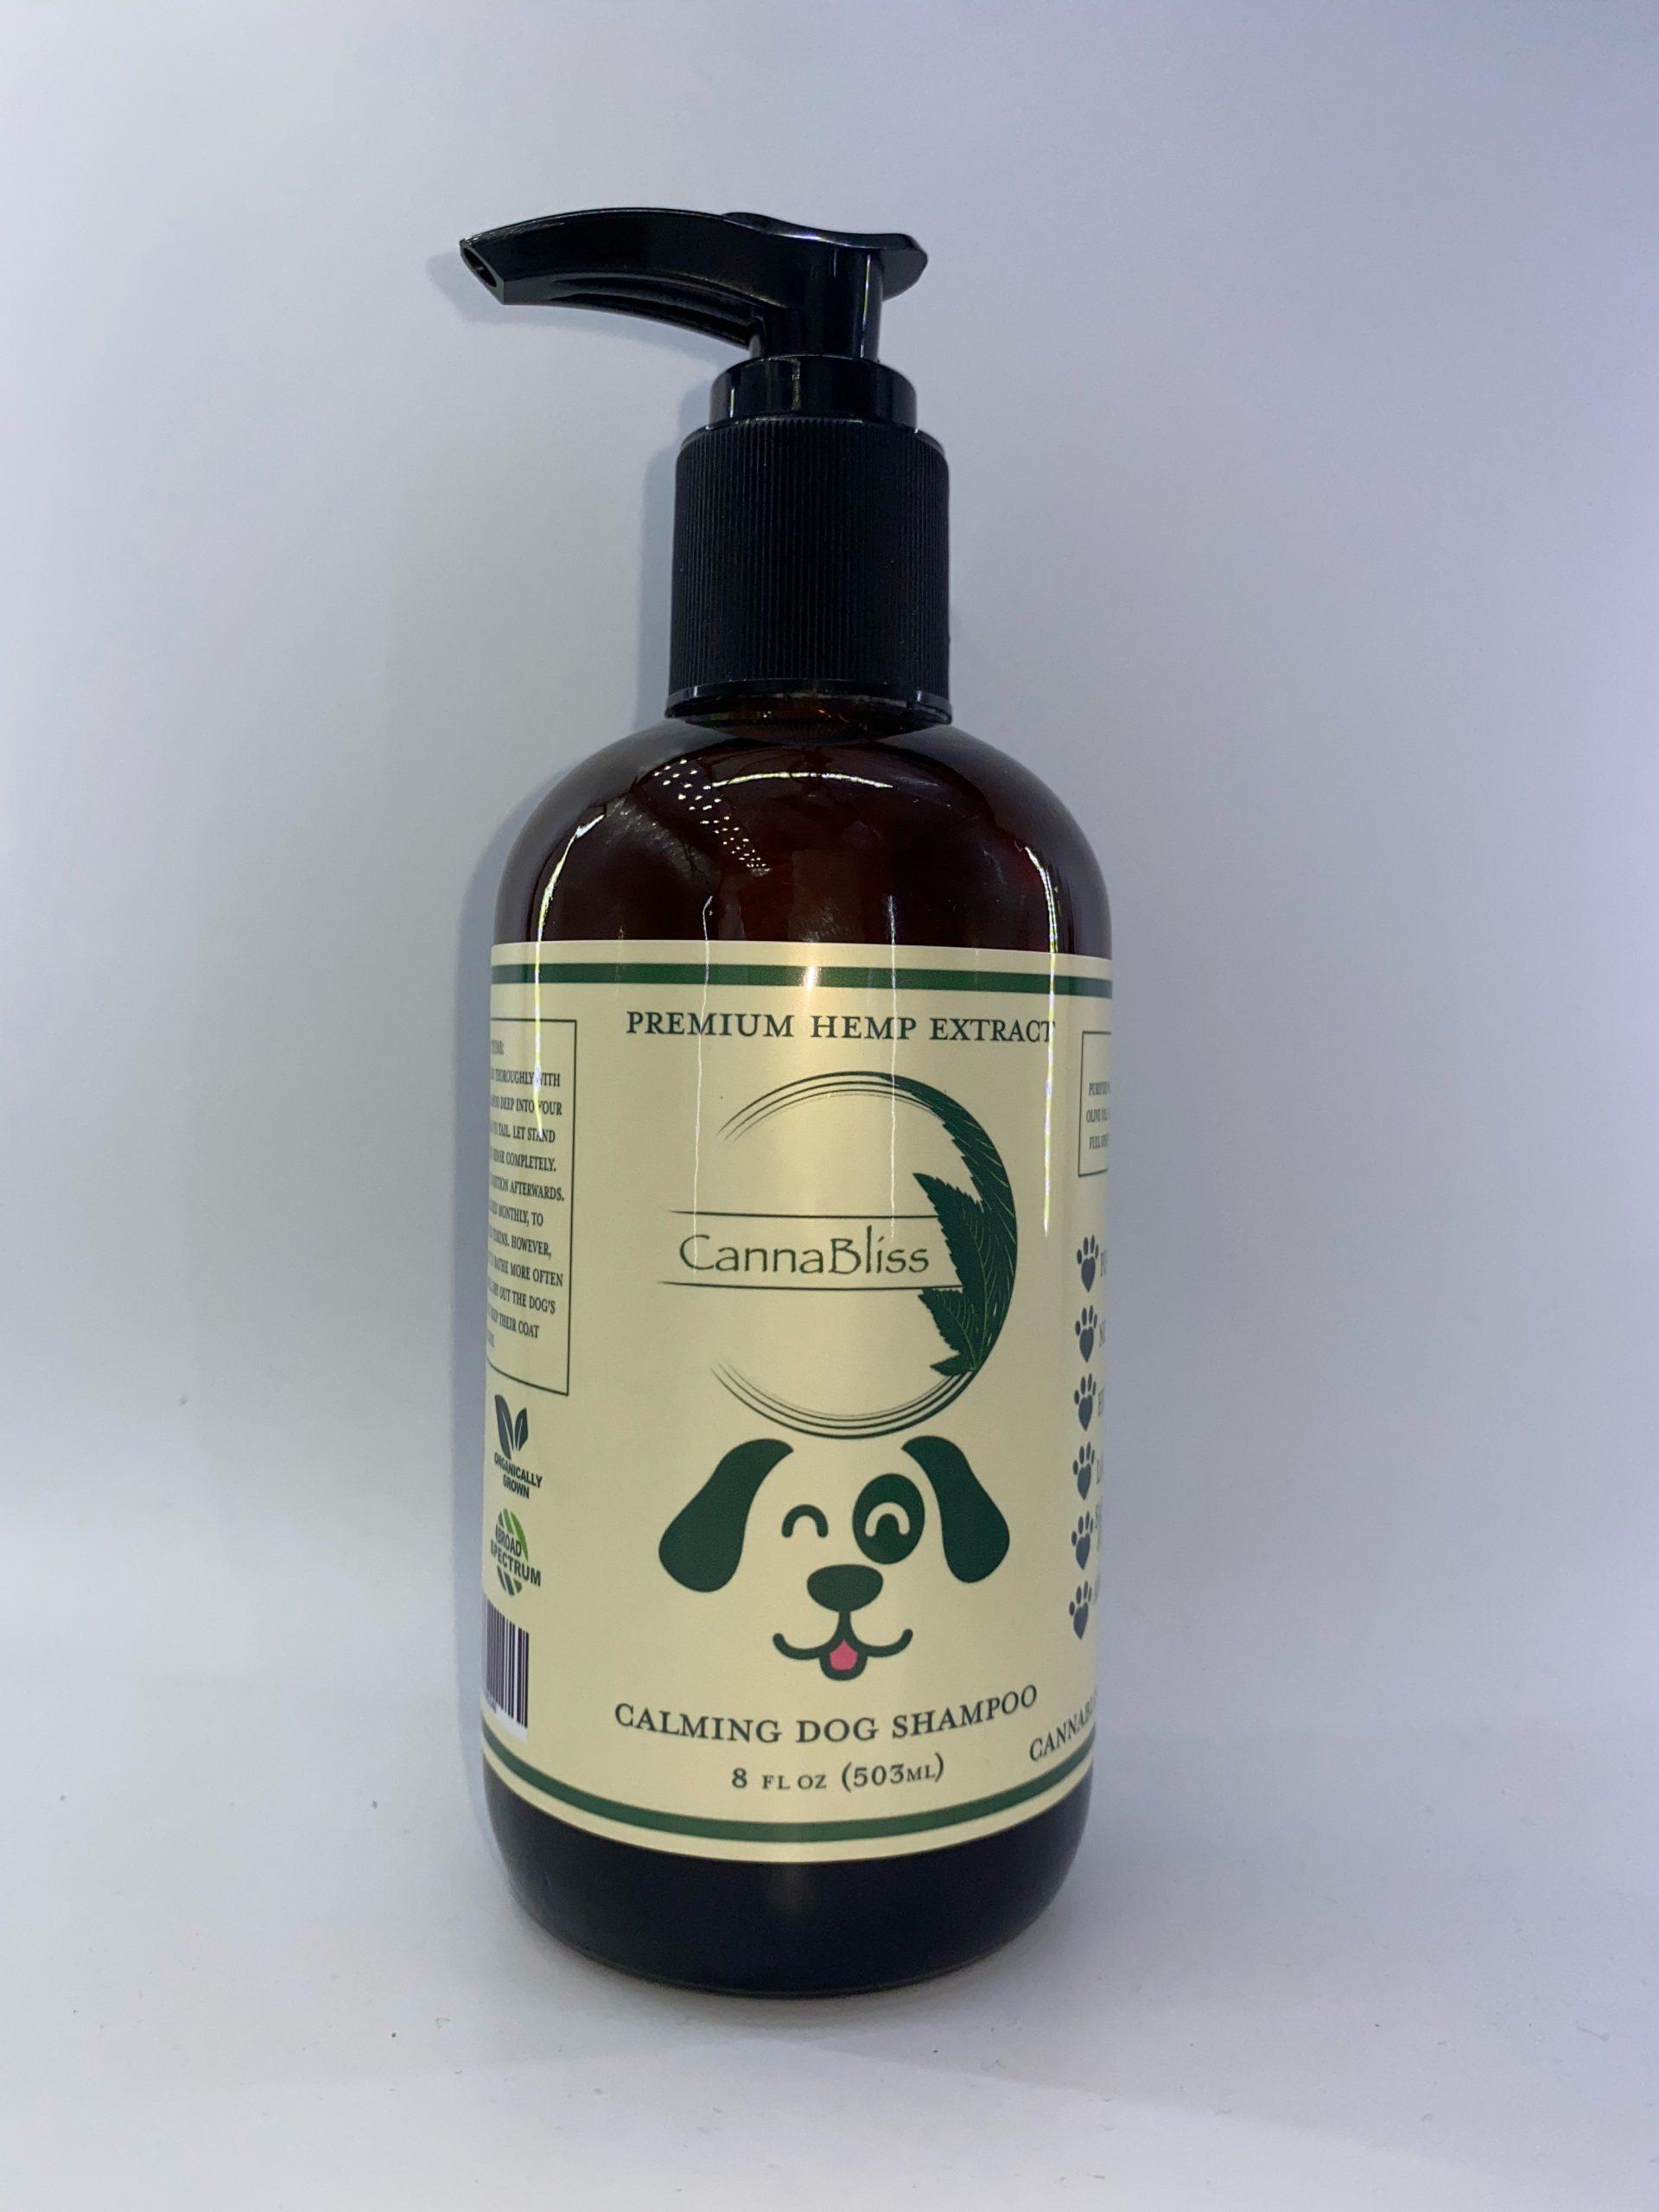 Calming Dog Shampoo